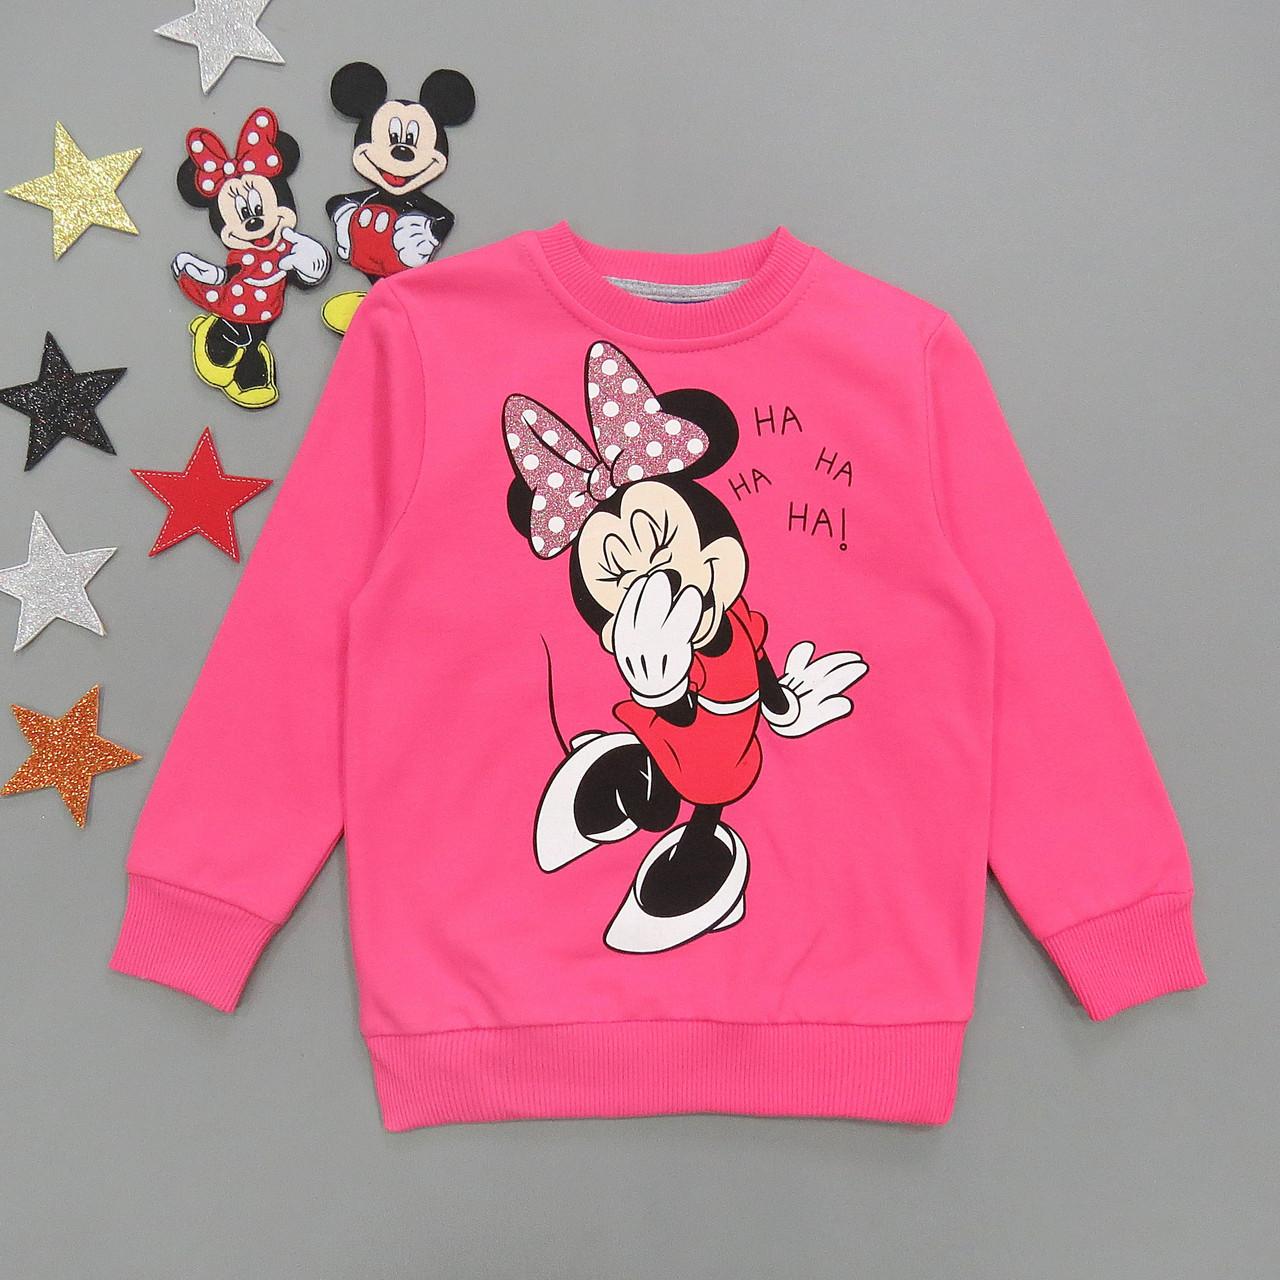 Теплый свитшот Minnie Mouse для девочки.